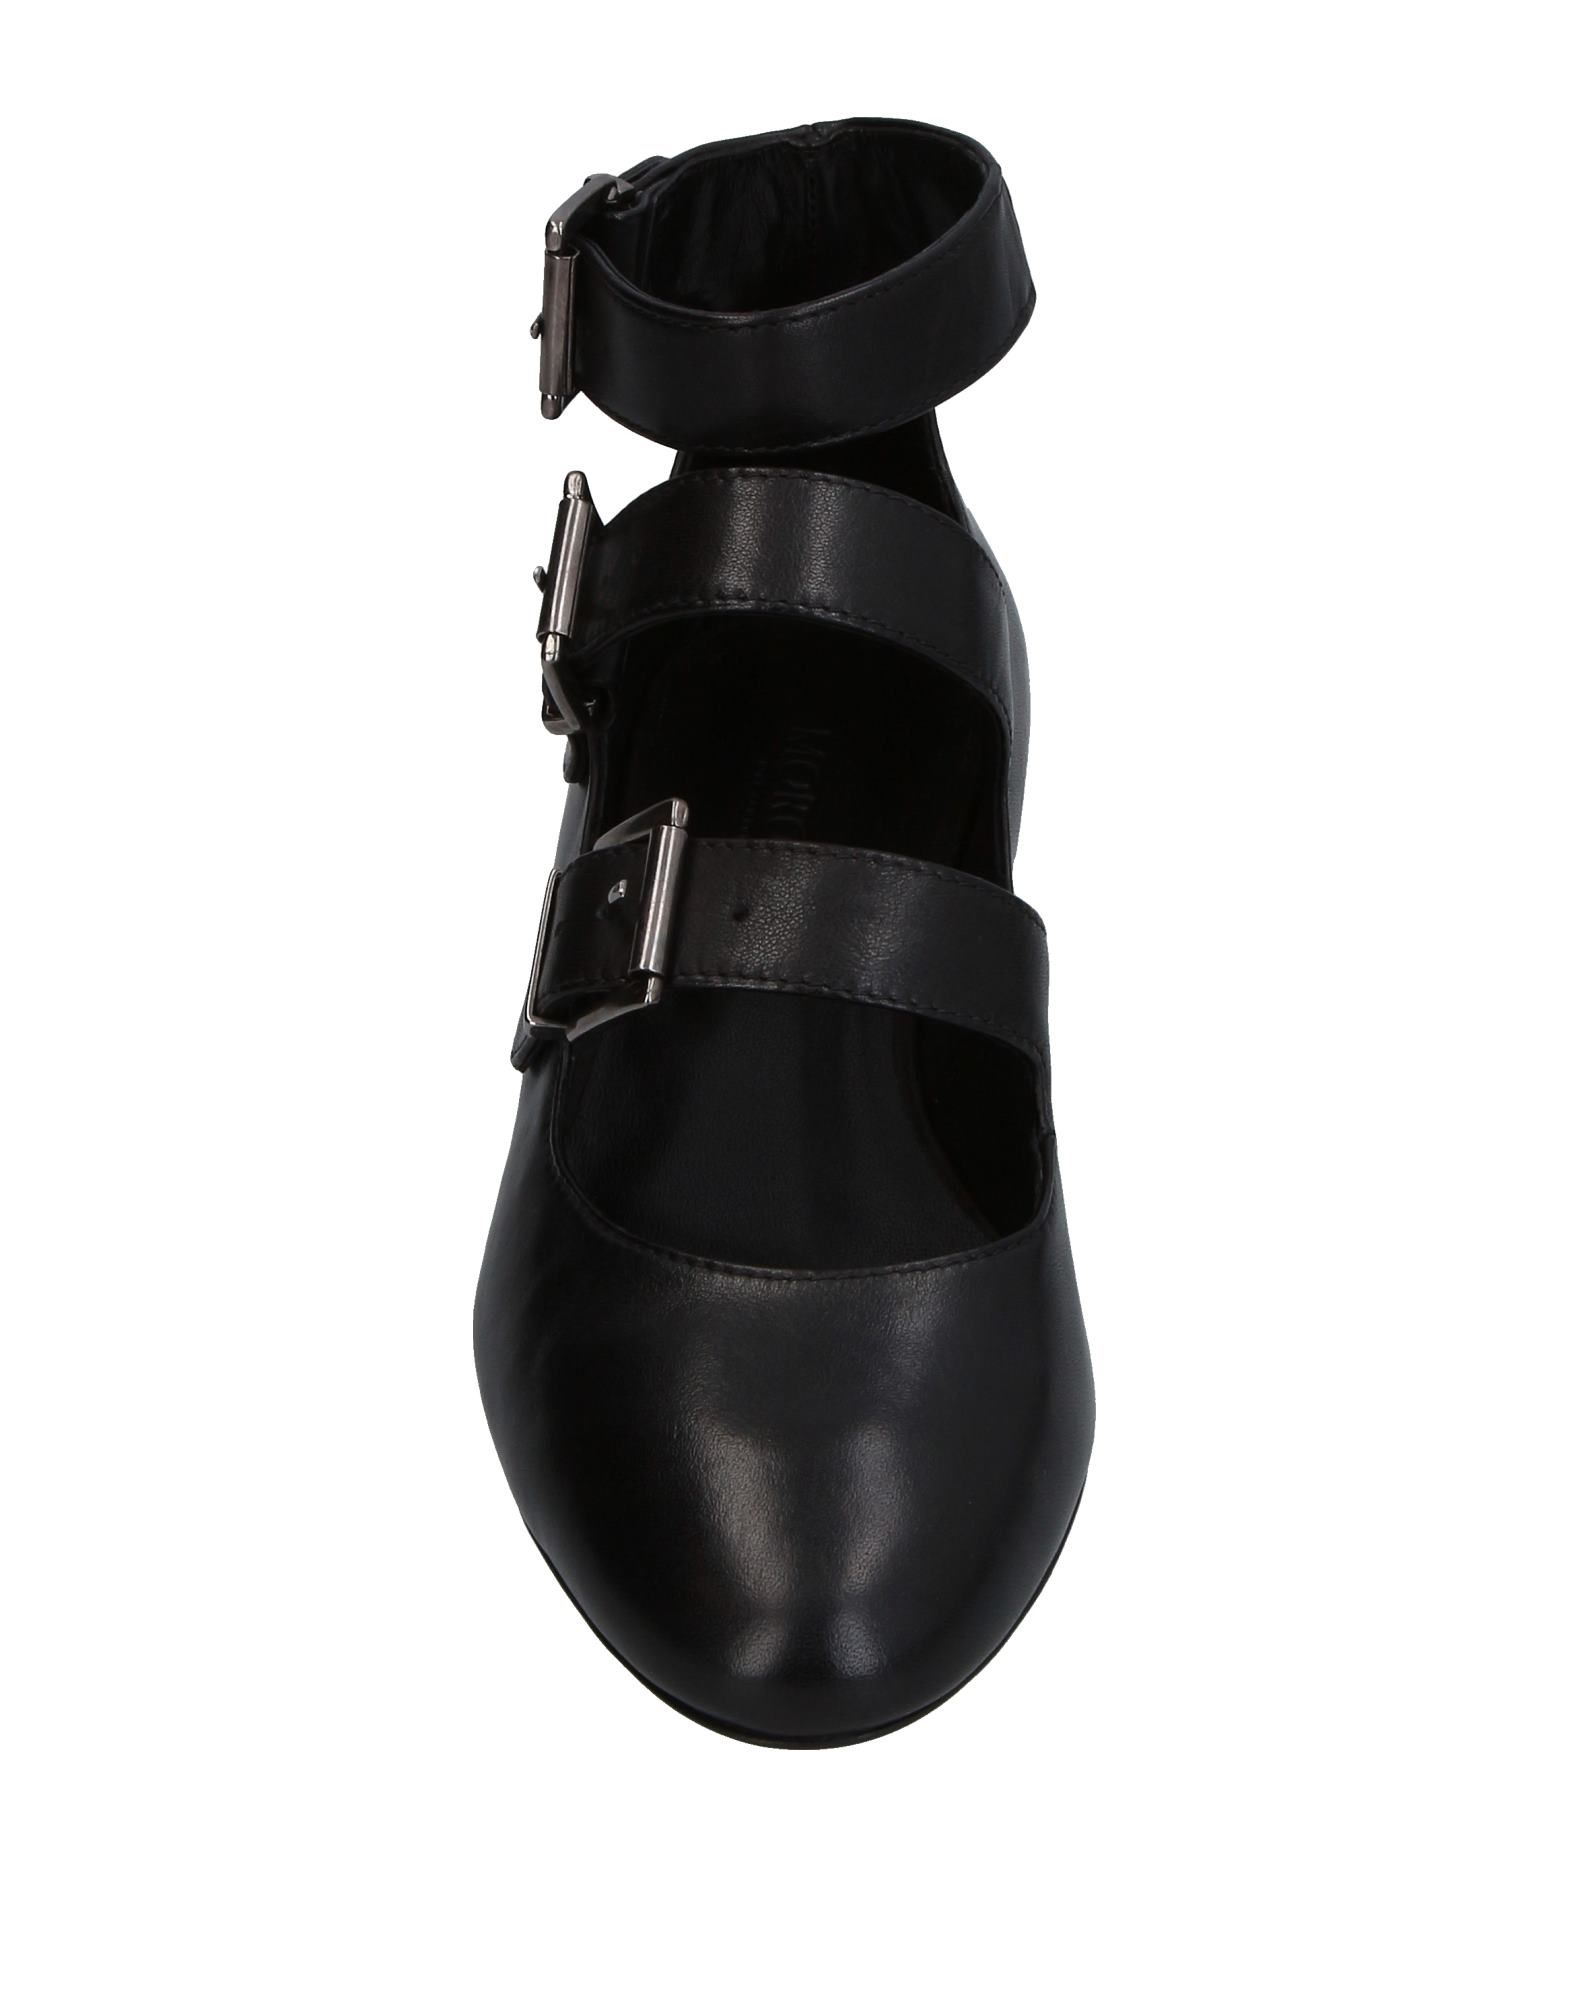 Morobē Ballerinas beliebte Damen  11363095AW Gute Qualität beliebte Ballerinas Schuhe 4a8c37